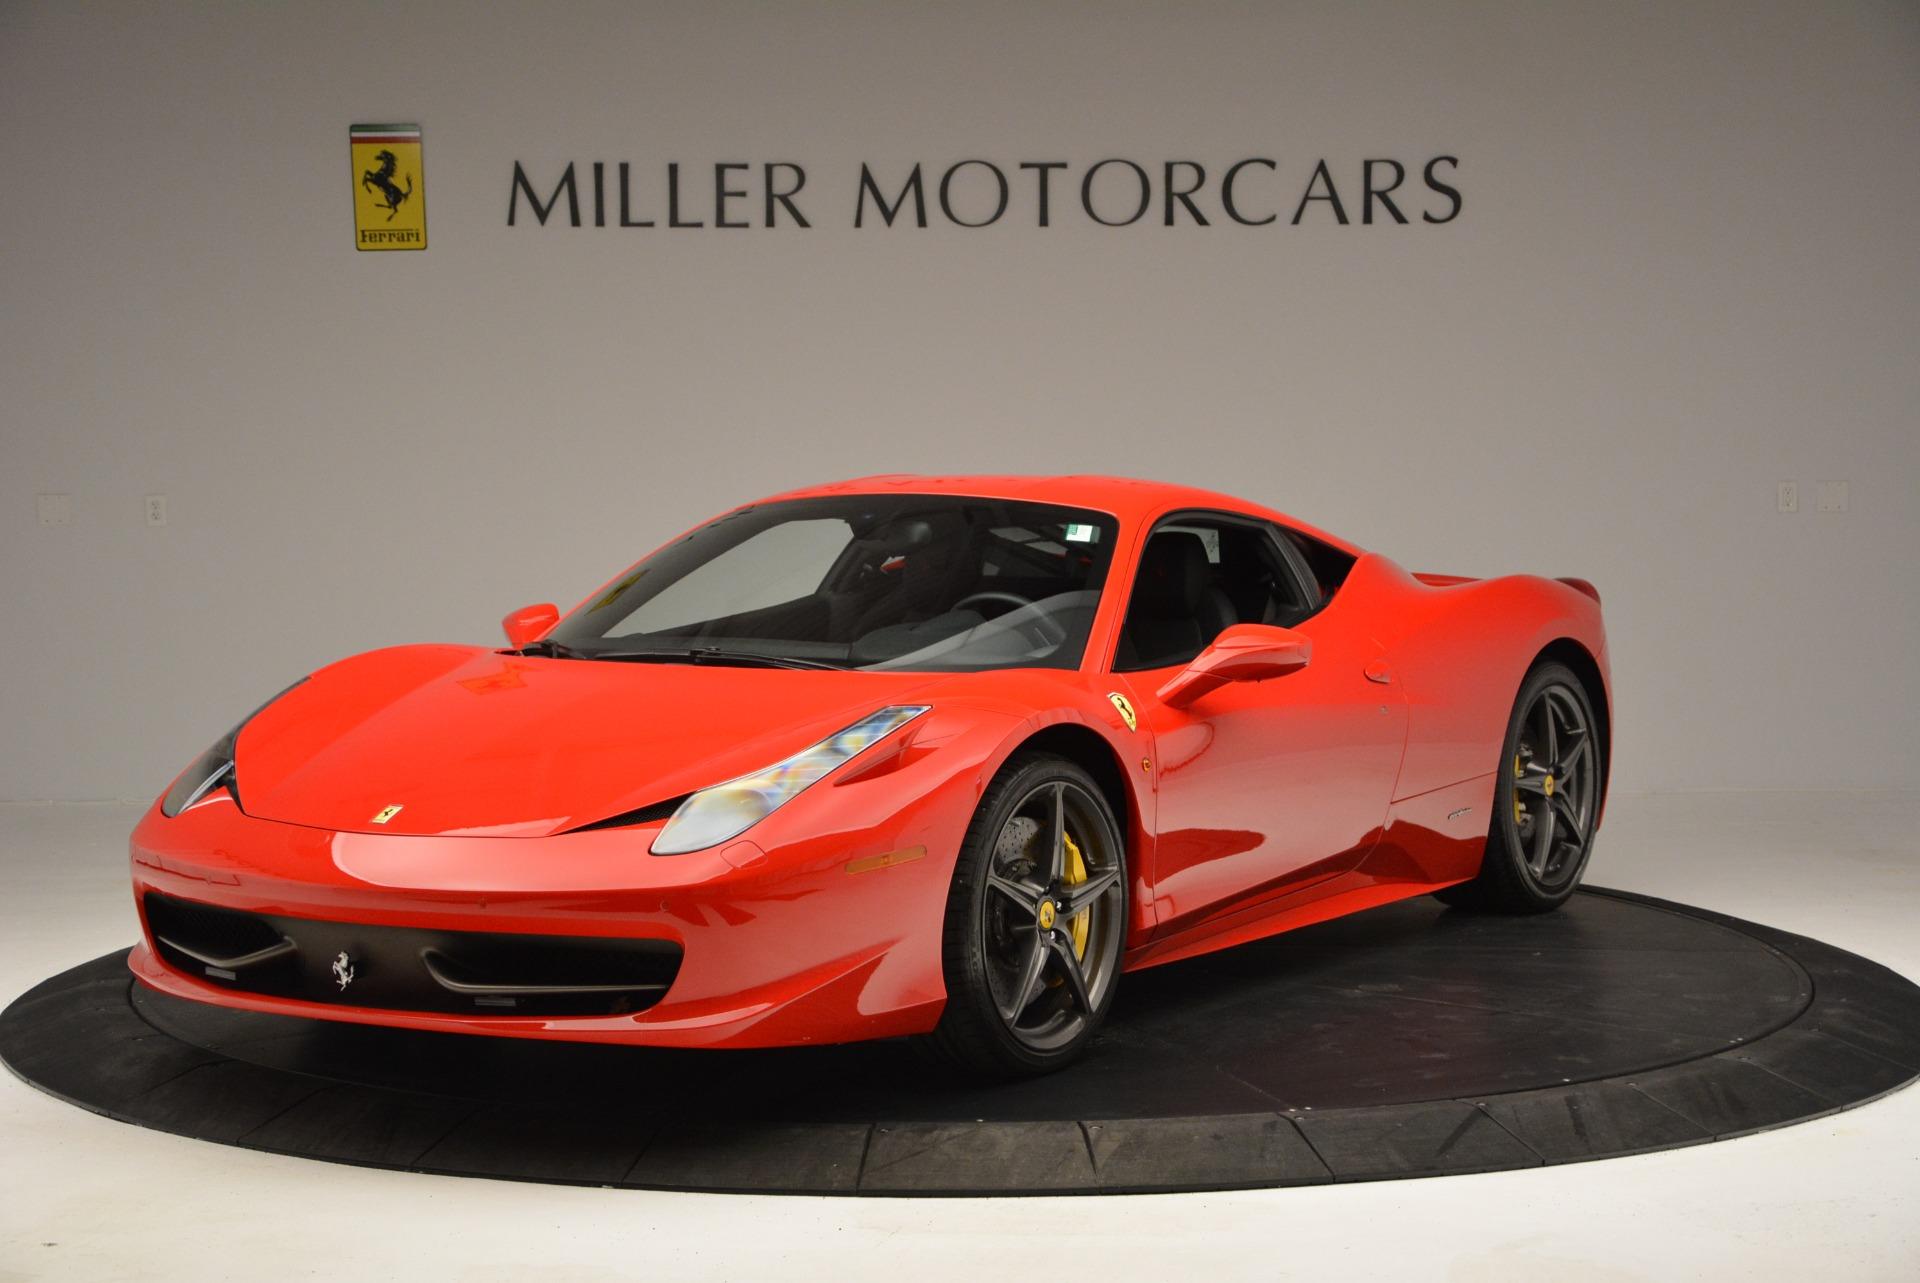 Used 2013 Ferrari 458 Italia for sale Sold at Bentley Greenwich in Greenwich CT 06830 1